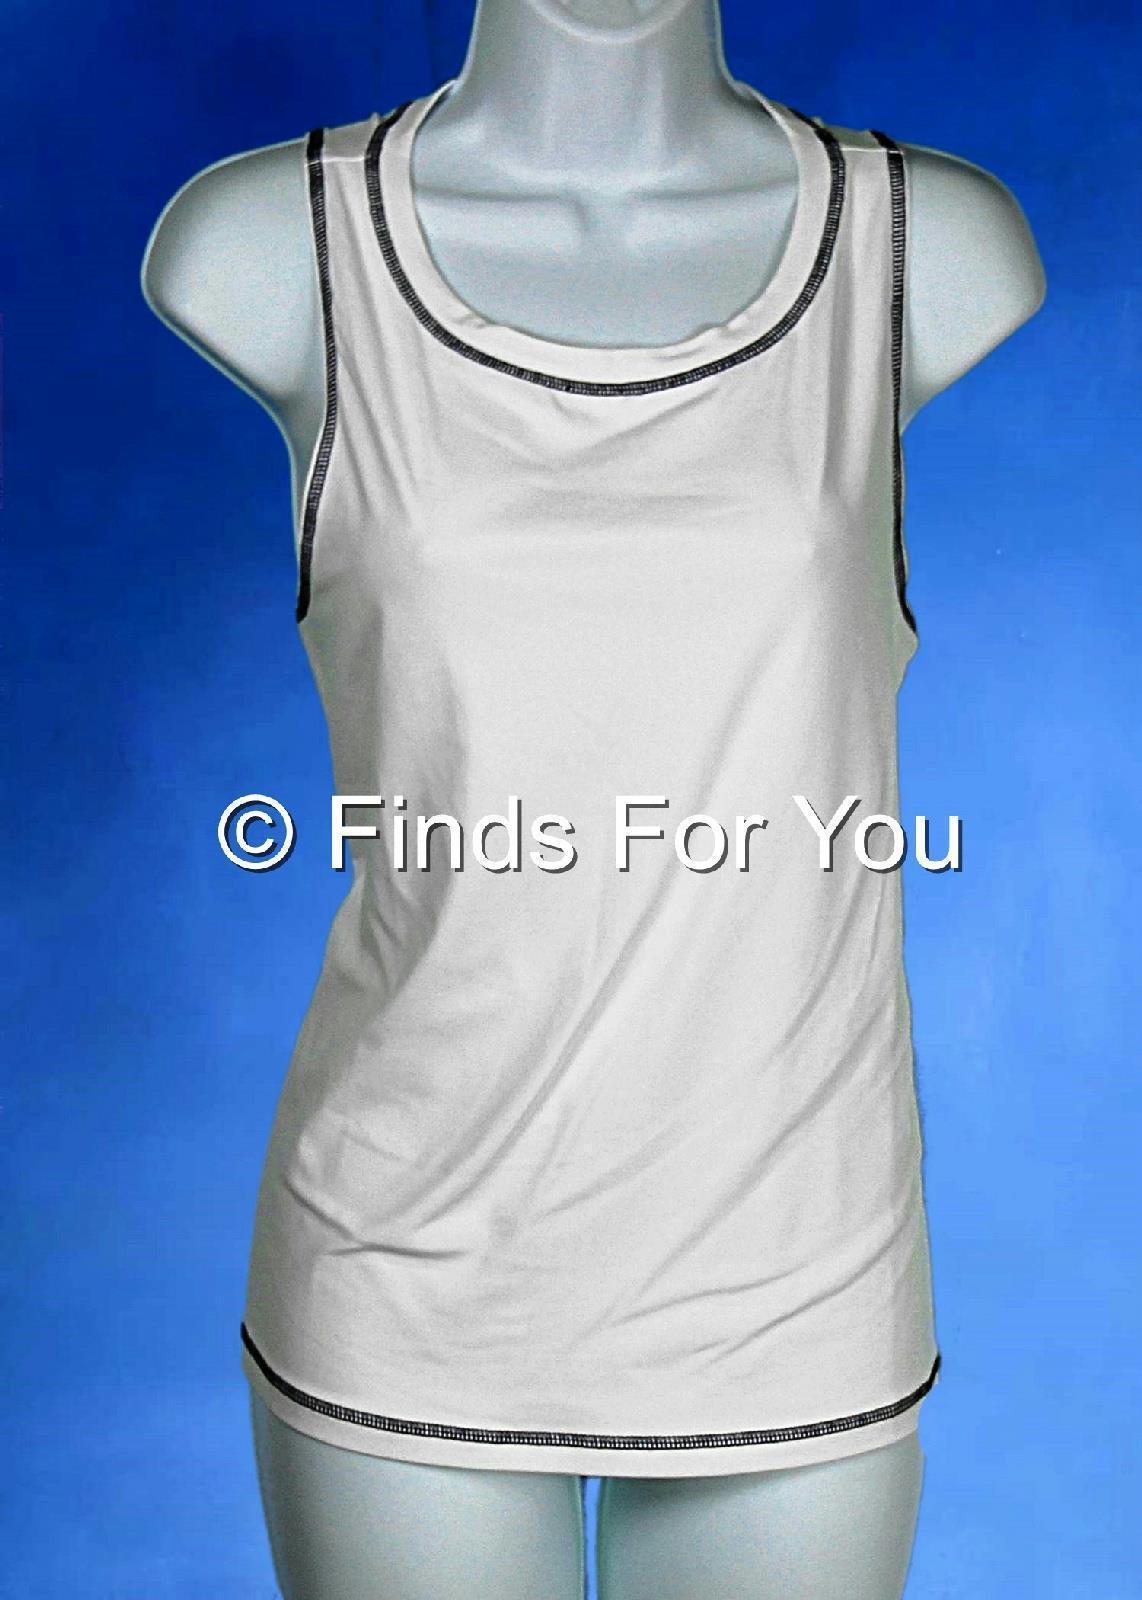 98ec06adce947 J Crew Factory Sleeveless Sun Shirt Rash Guard Swimsuit Bathing Suit S  38602 - $18.39